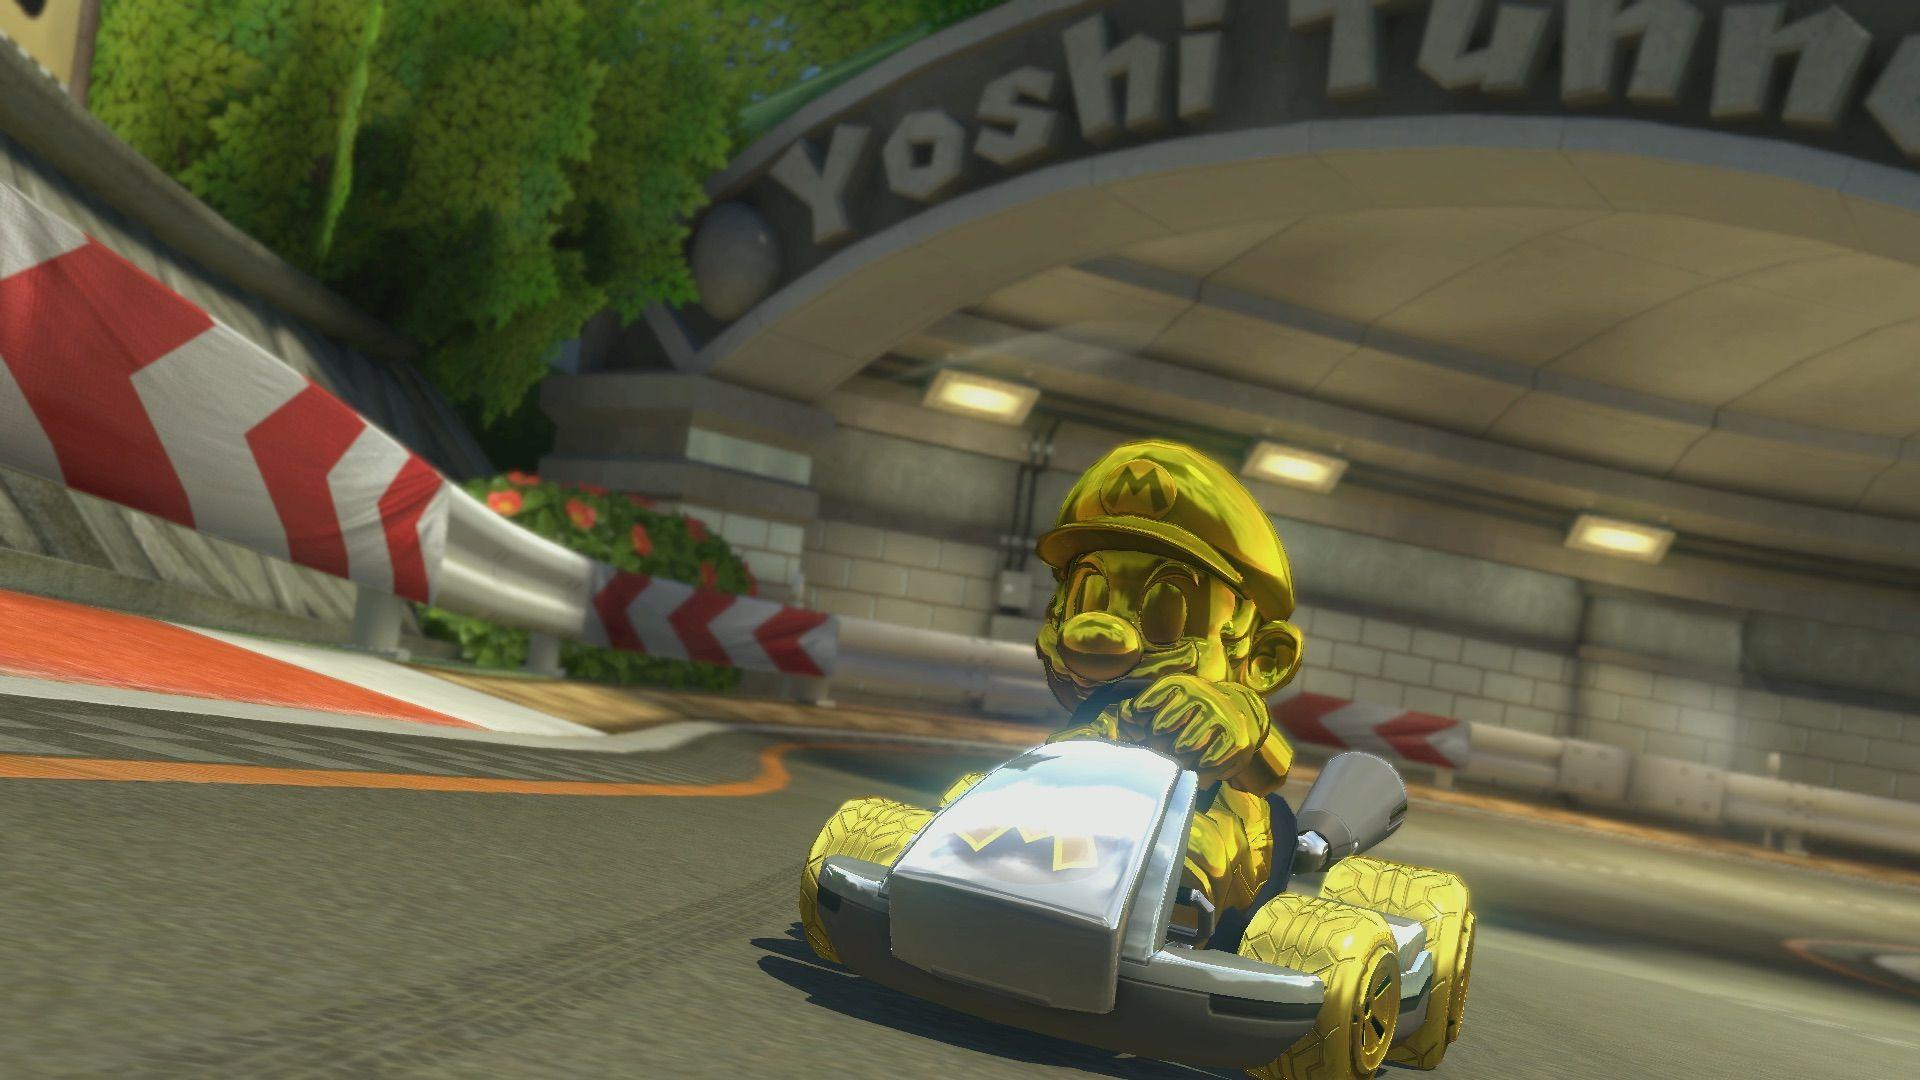 Mario Kart 8 Nintendo Switch And Wii U Video Comparison Mario Kart Mario Kart Wii Mario Kart 8